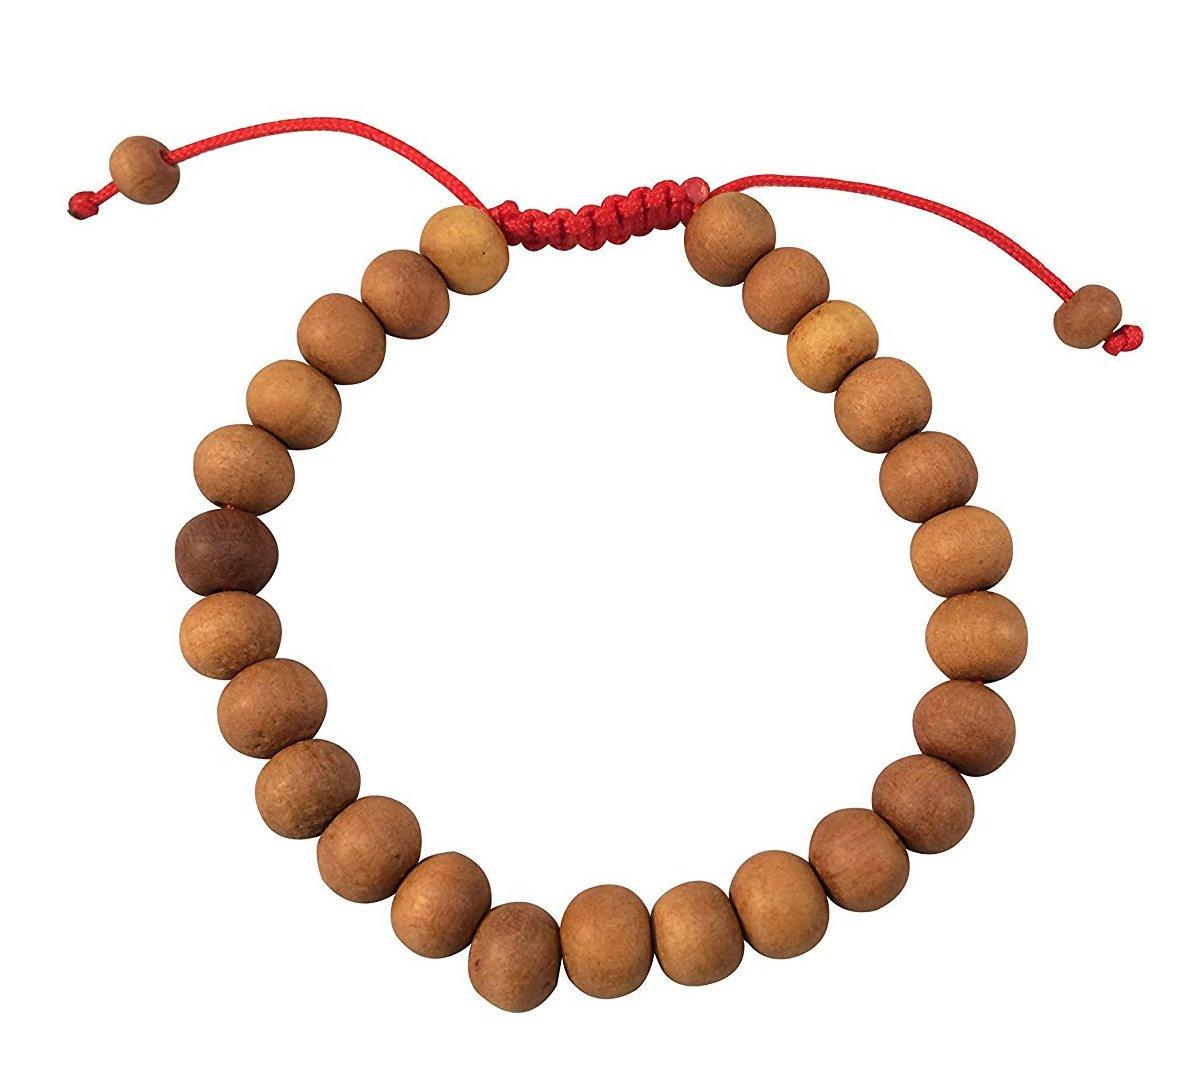 Tribe Azure Tibetan Sandalwood Wrist Mala Bracelet Adjustable Healing Meditation Yoga Buddhist Wood Chakra